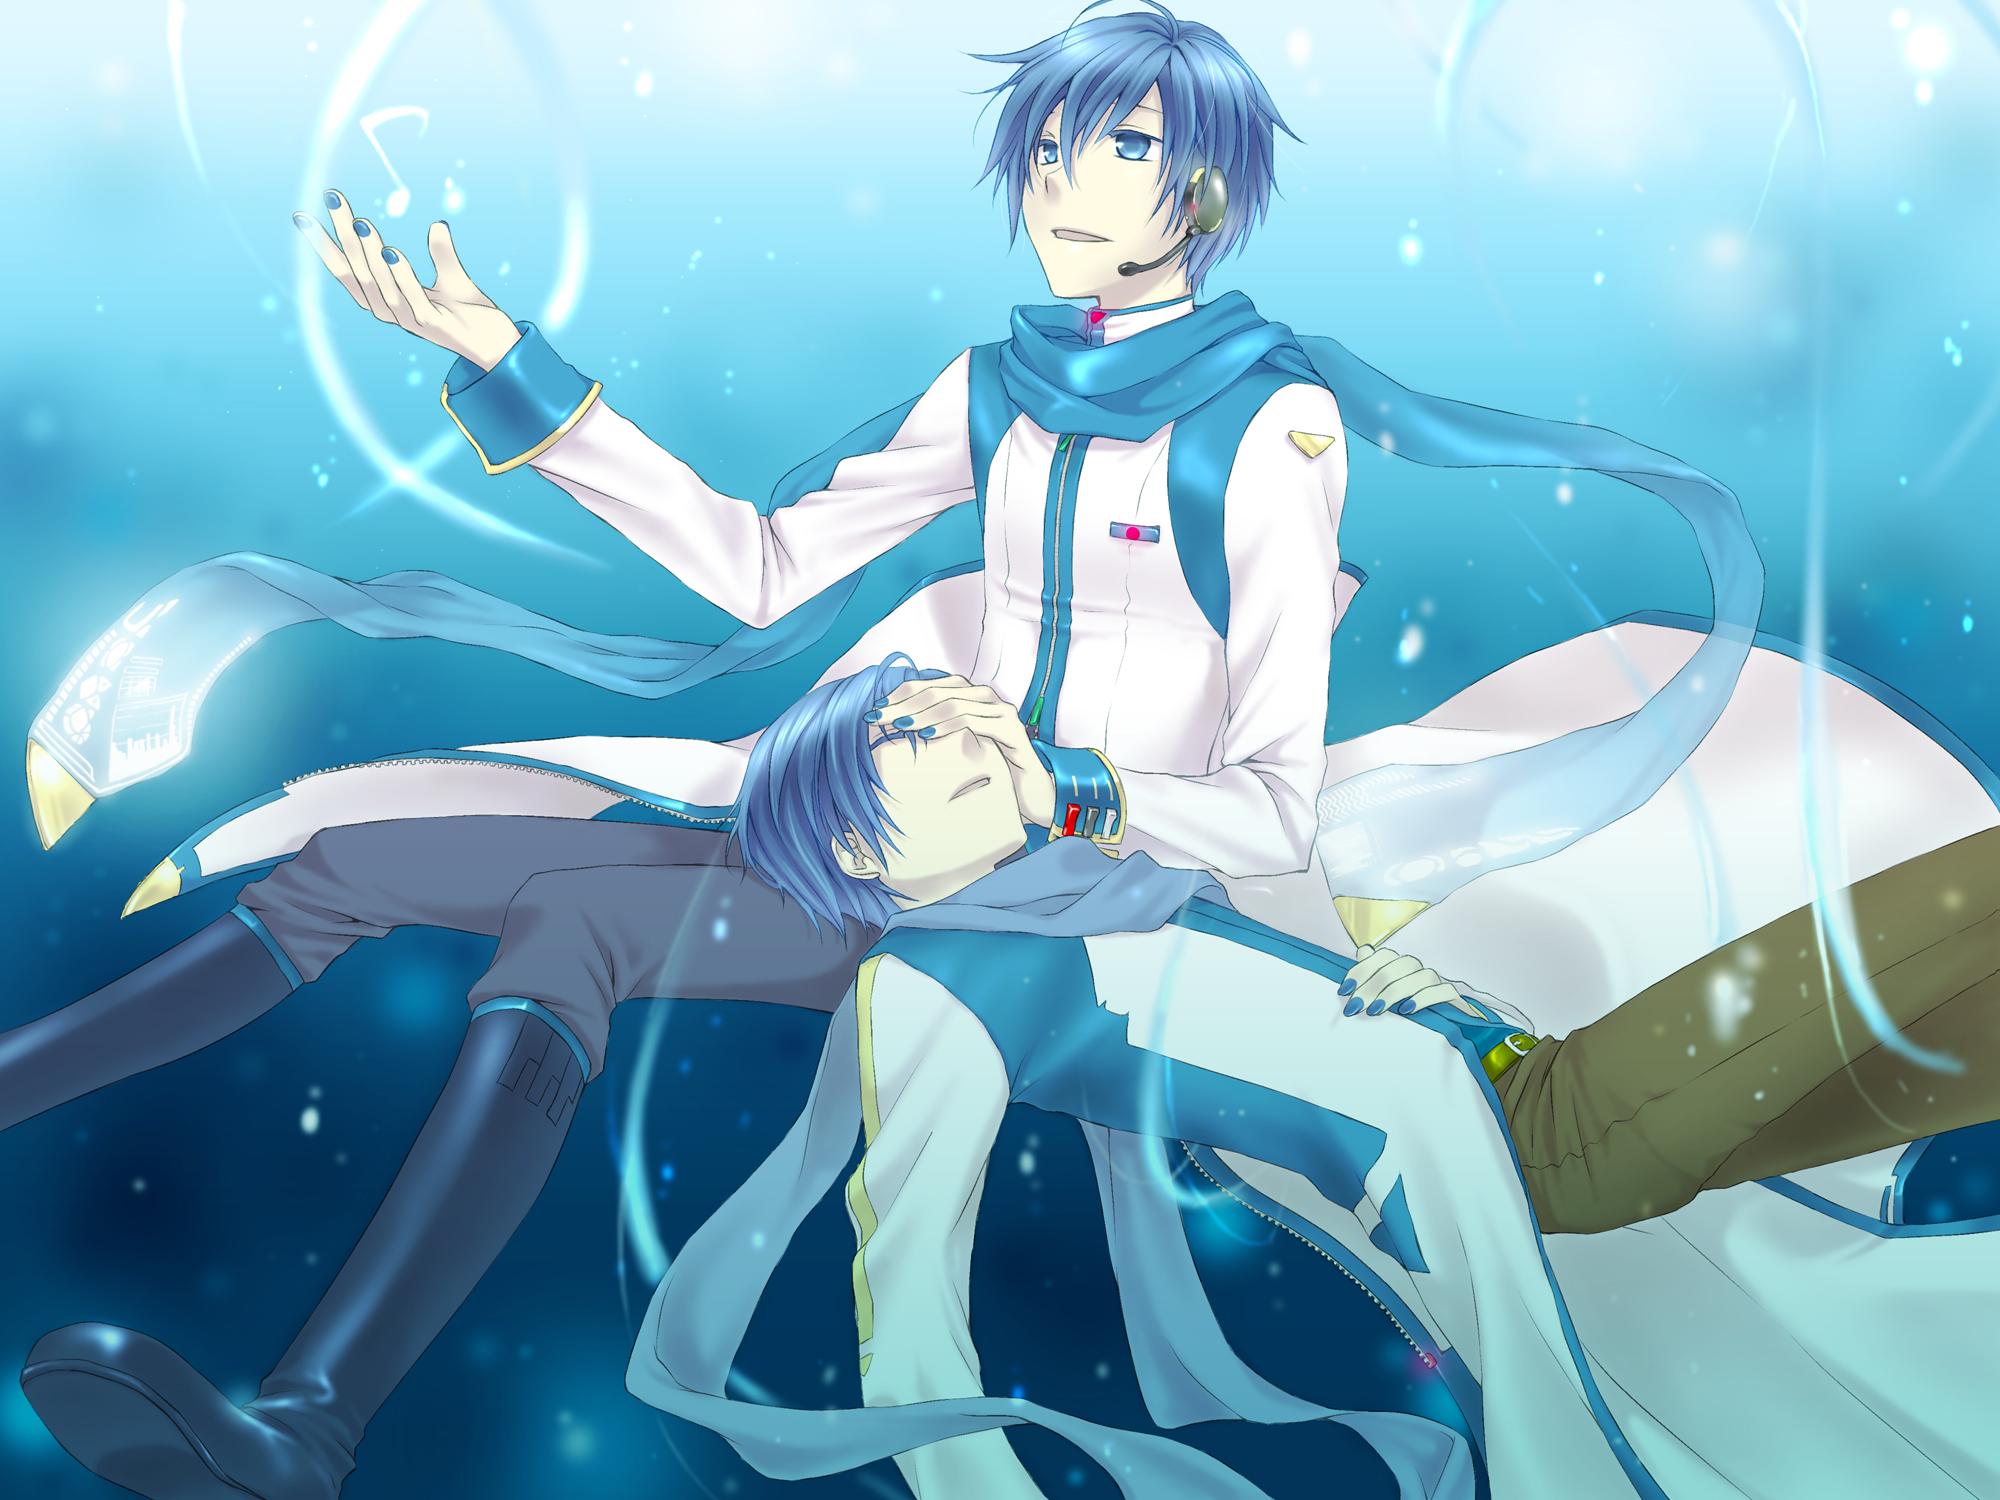 kaito - vocaloid - image #1409163 - zerochan anime image board